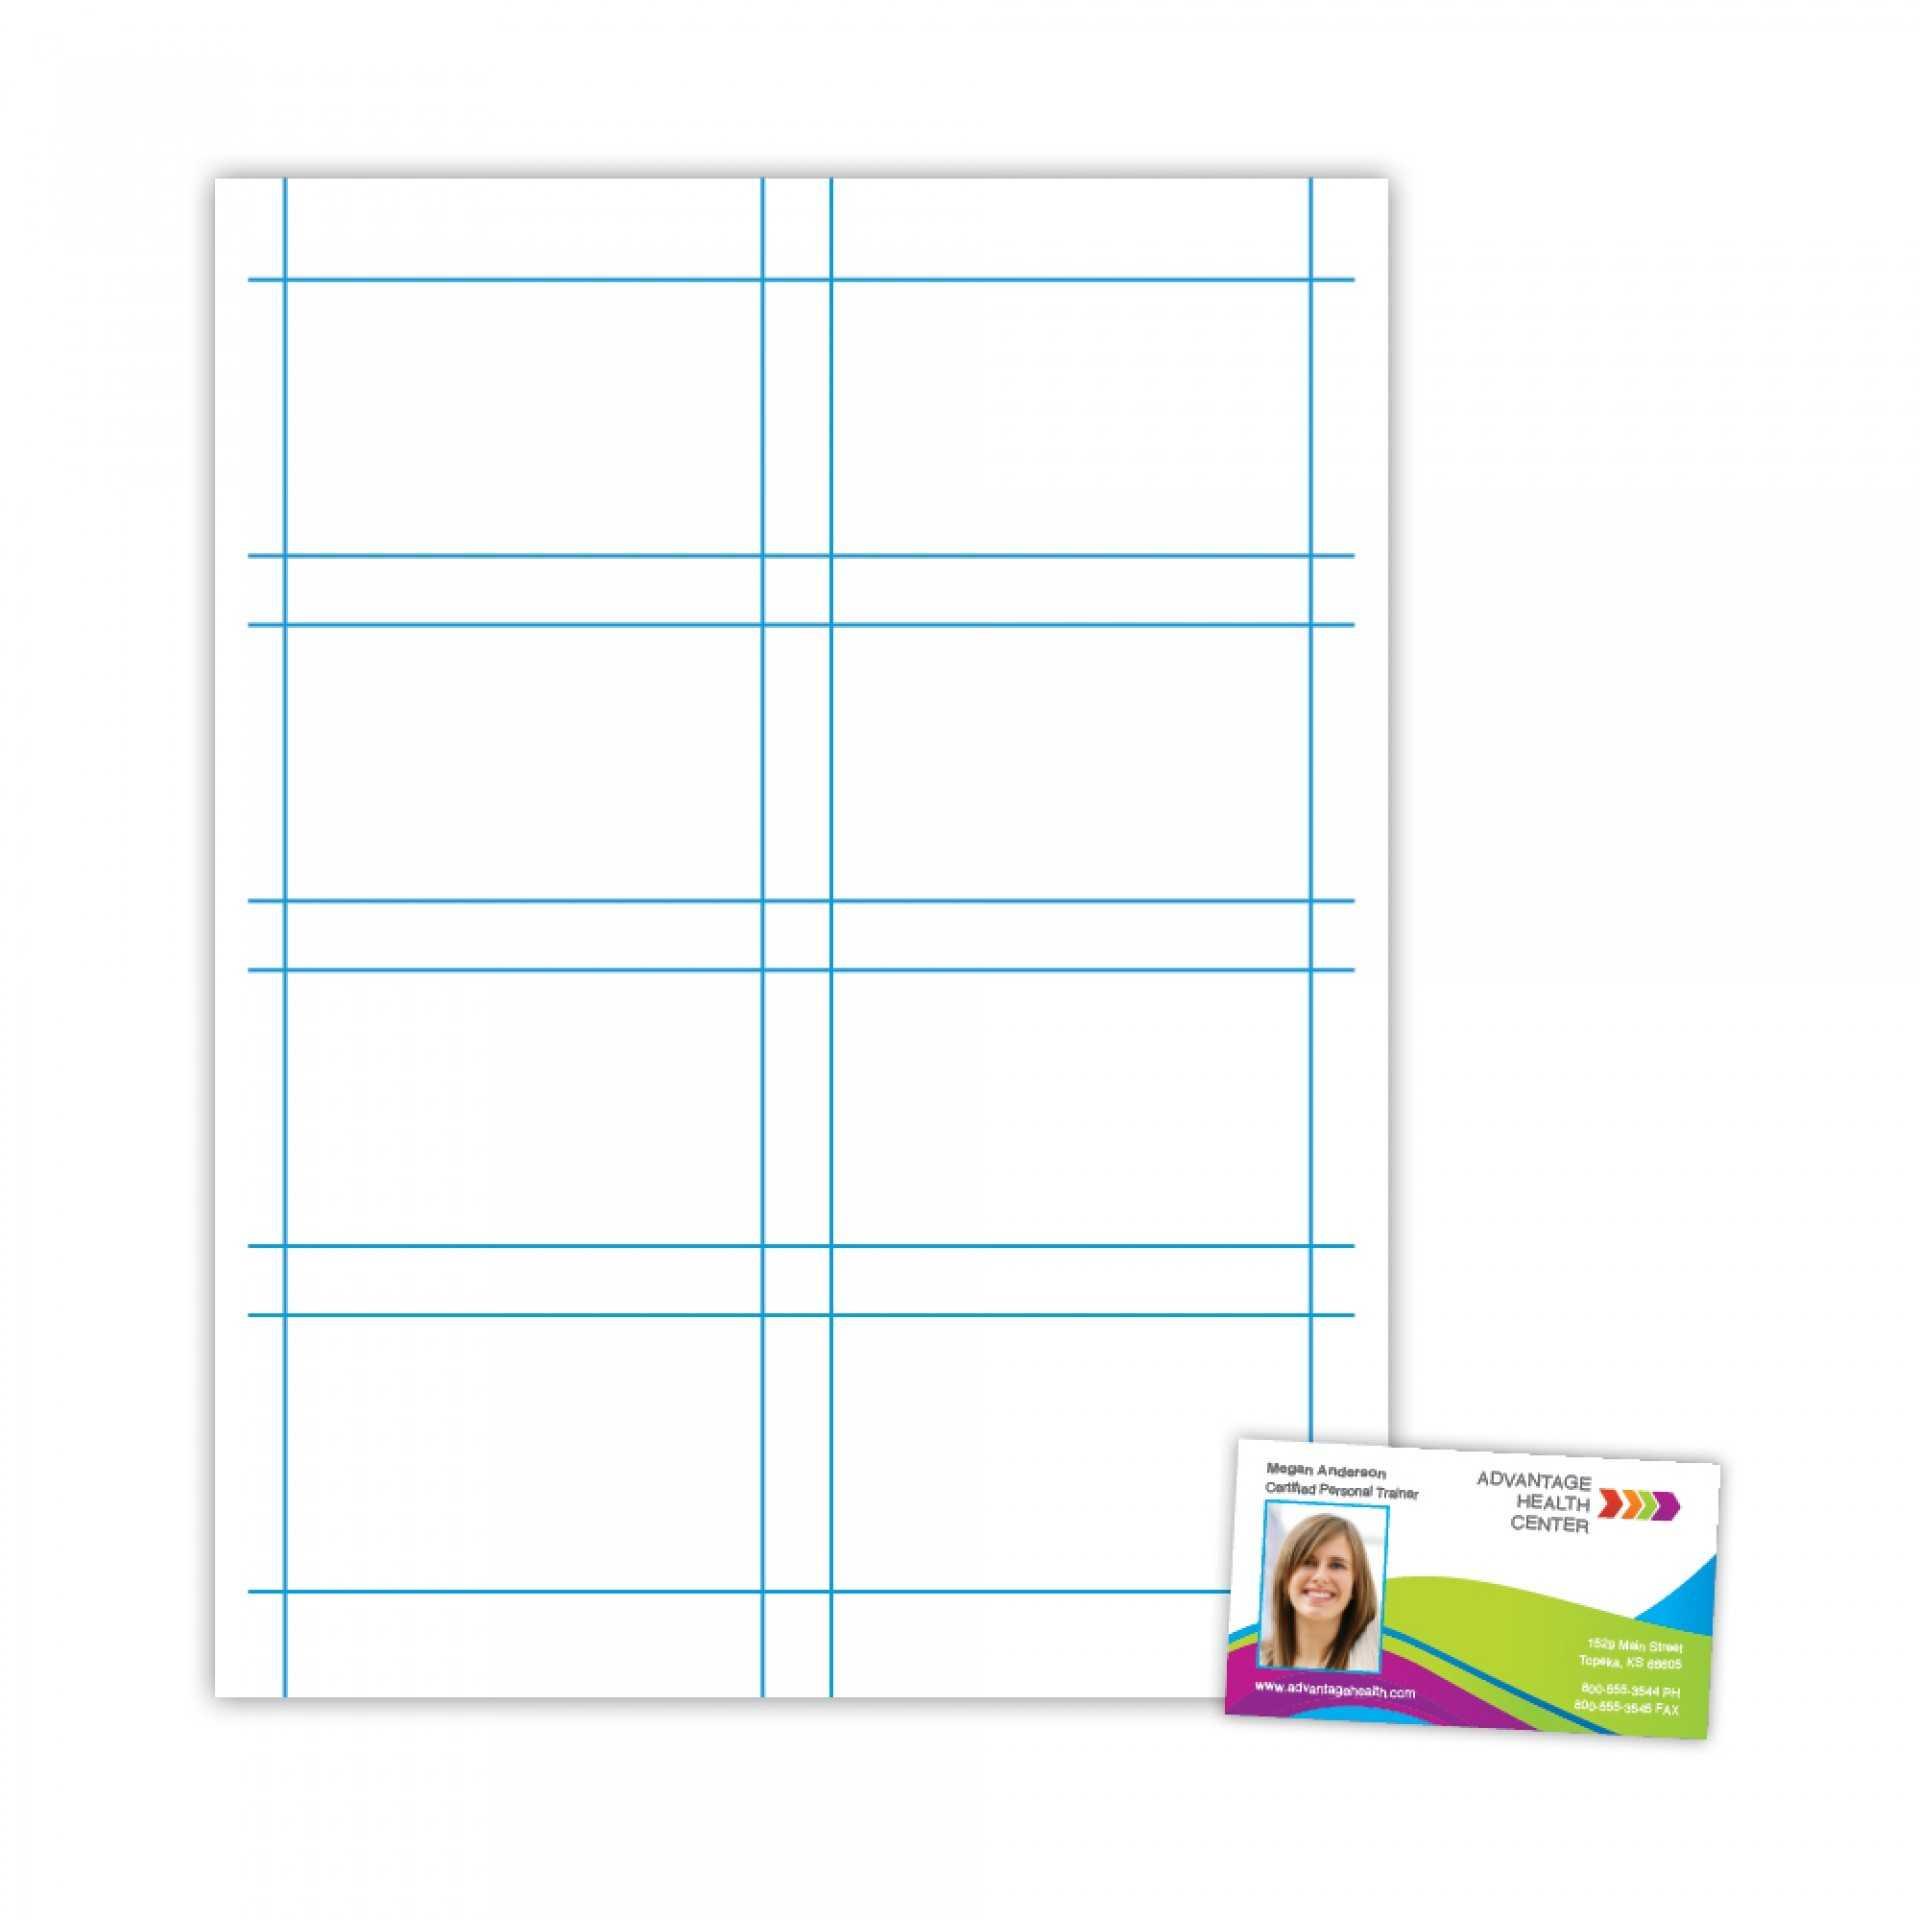 023 Blank Business Card Template Free Ideas Design Lovely Throughout Blank Business Card Template Photoshop